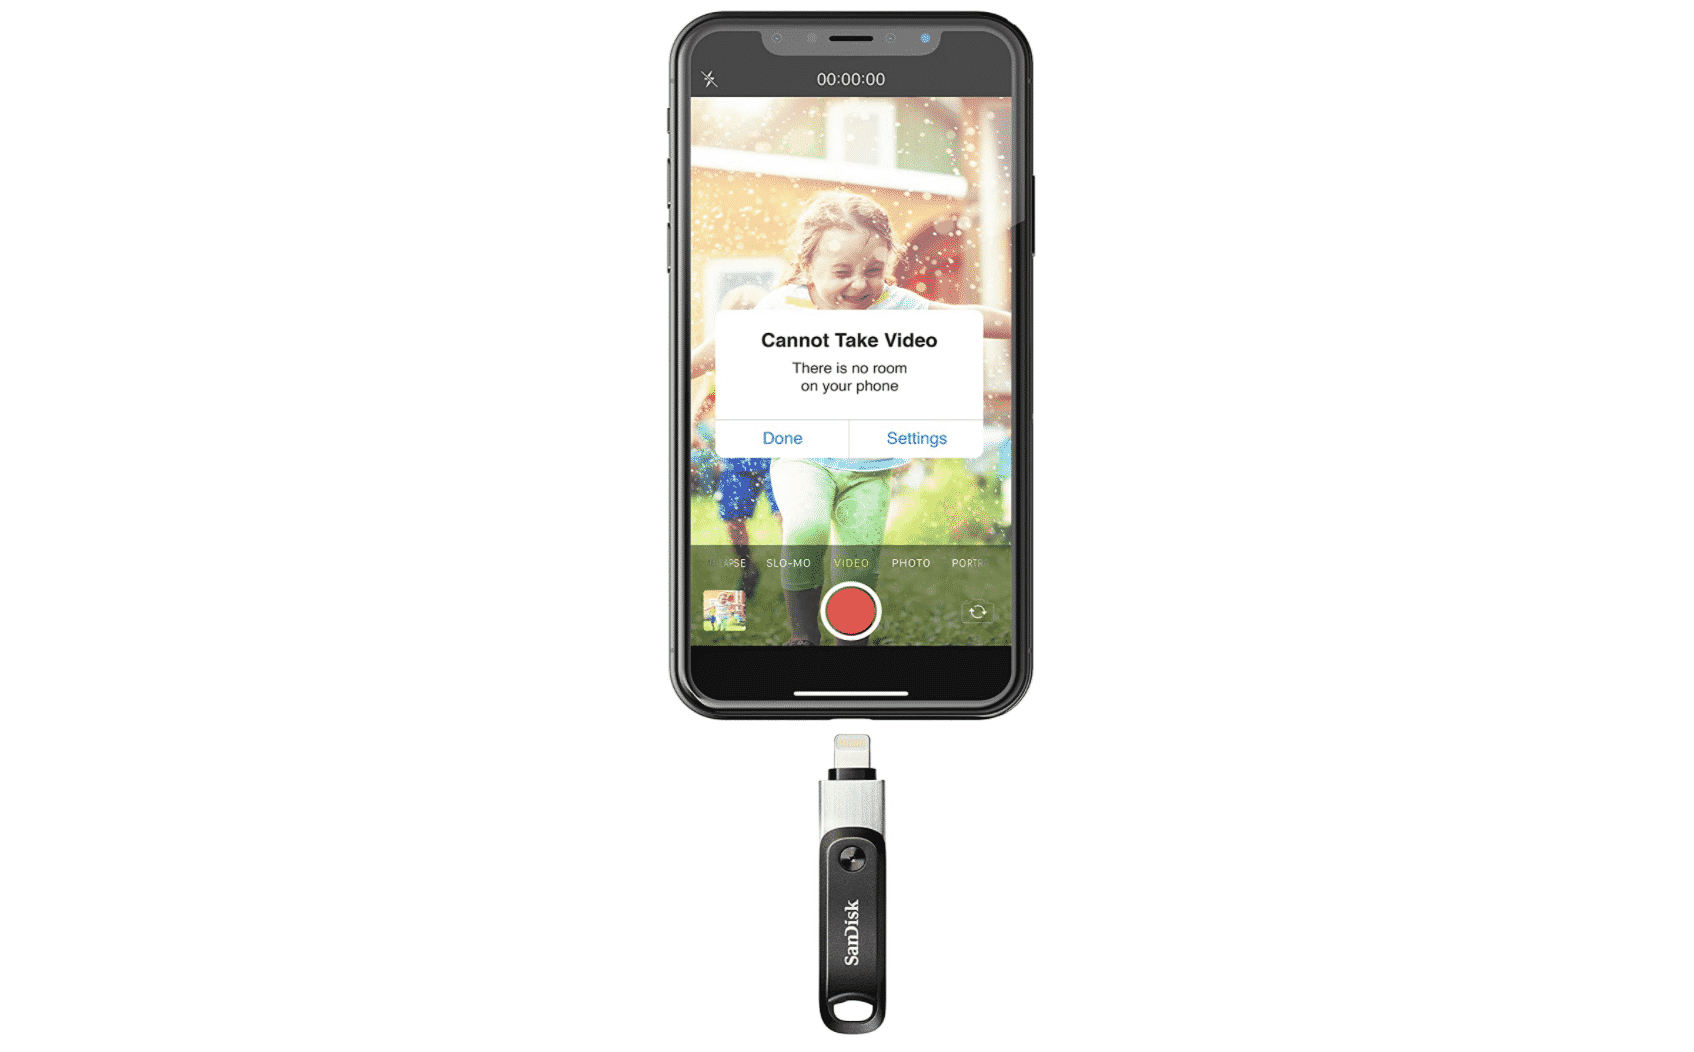 SanDisk 256GB iXpand Drive